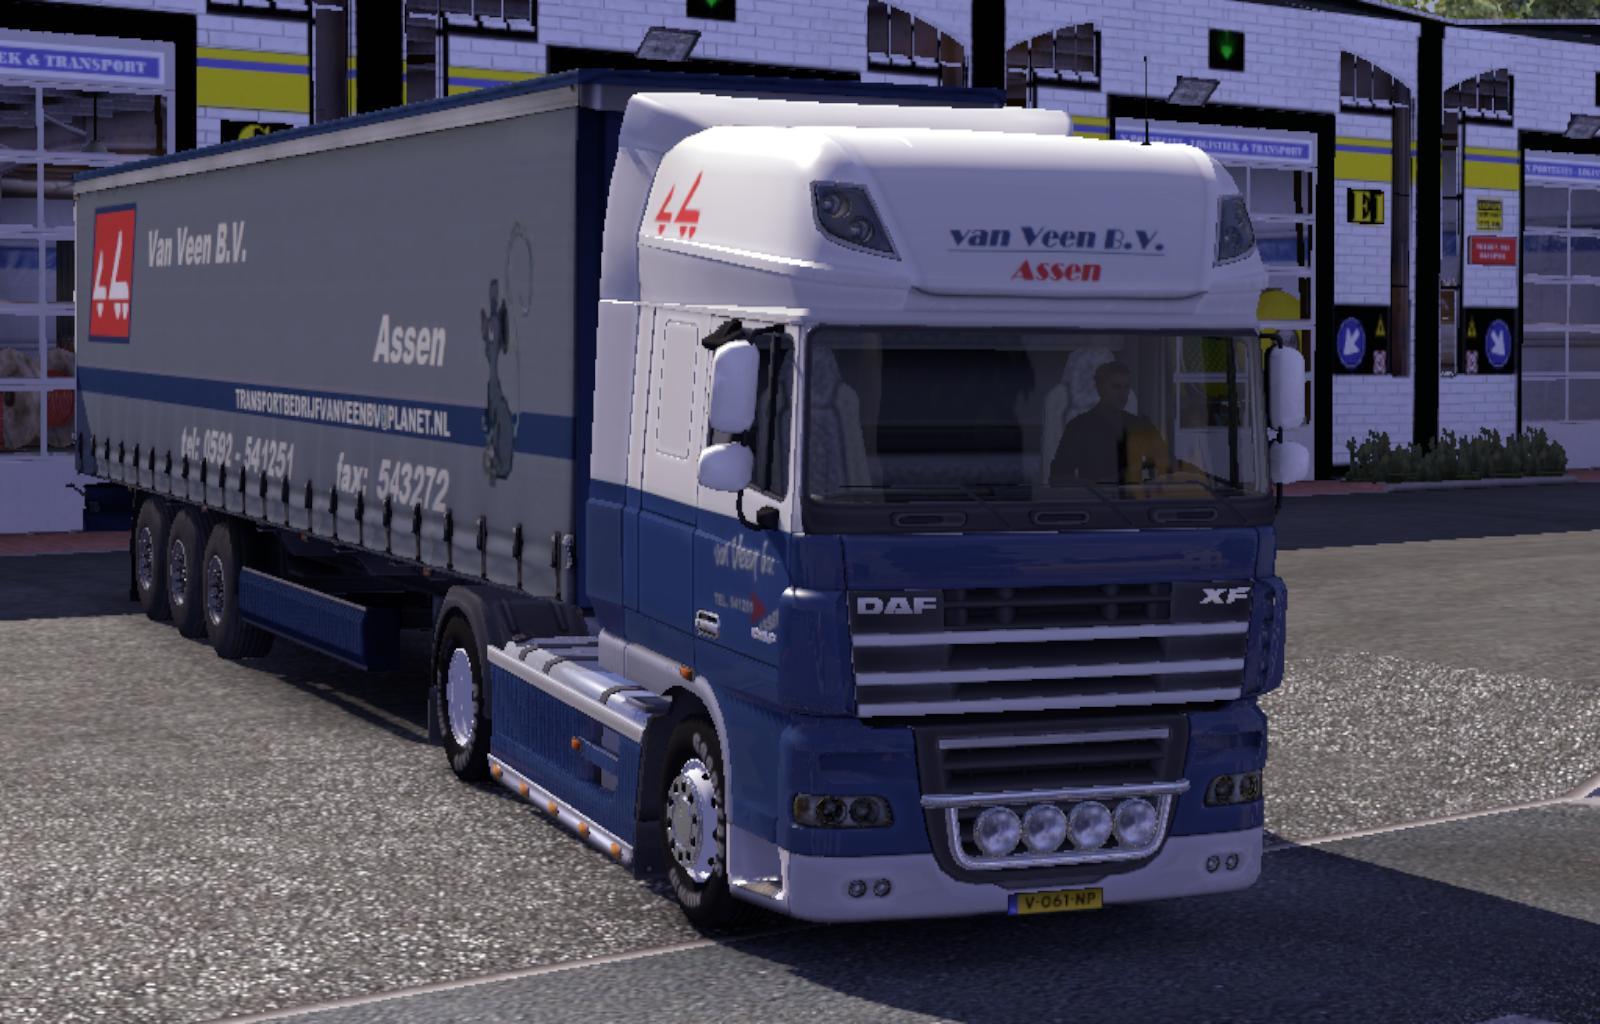 van-veen-b-v-assen-daf-trailer-1-9-22_3.